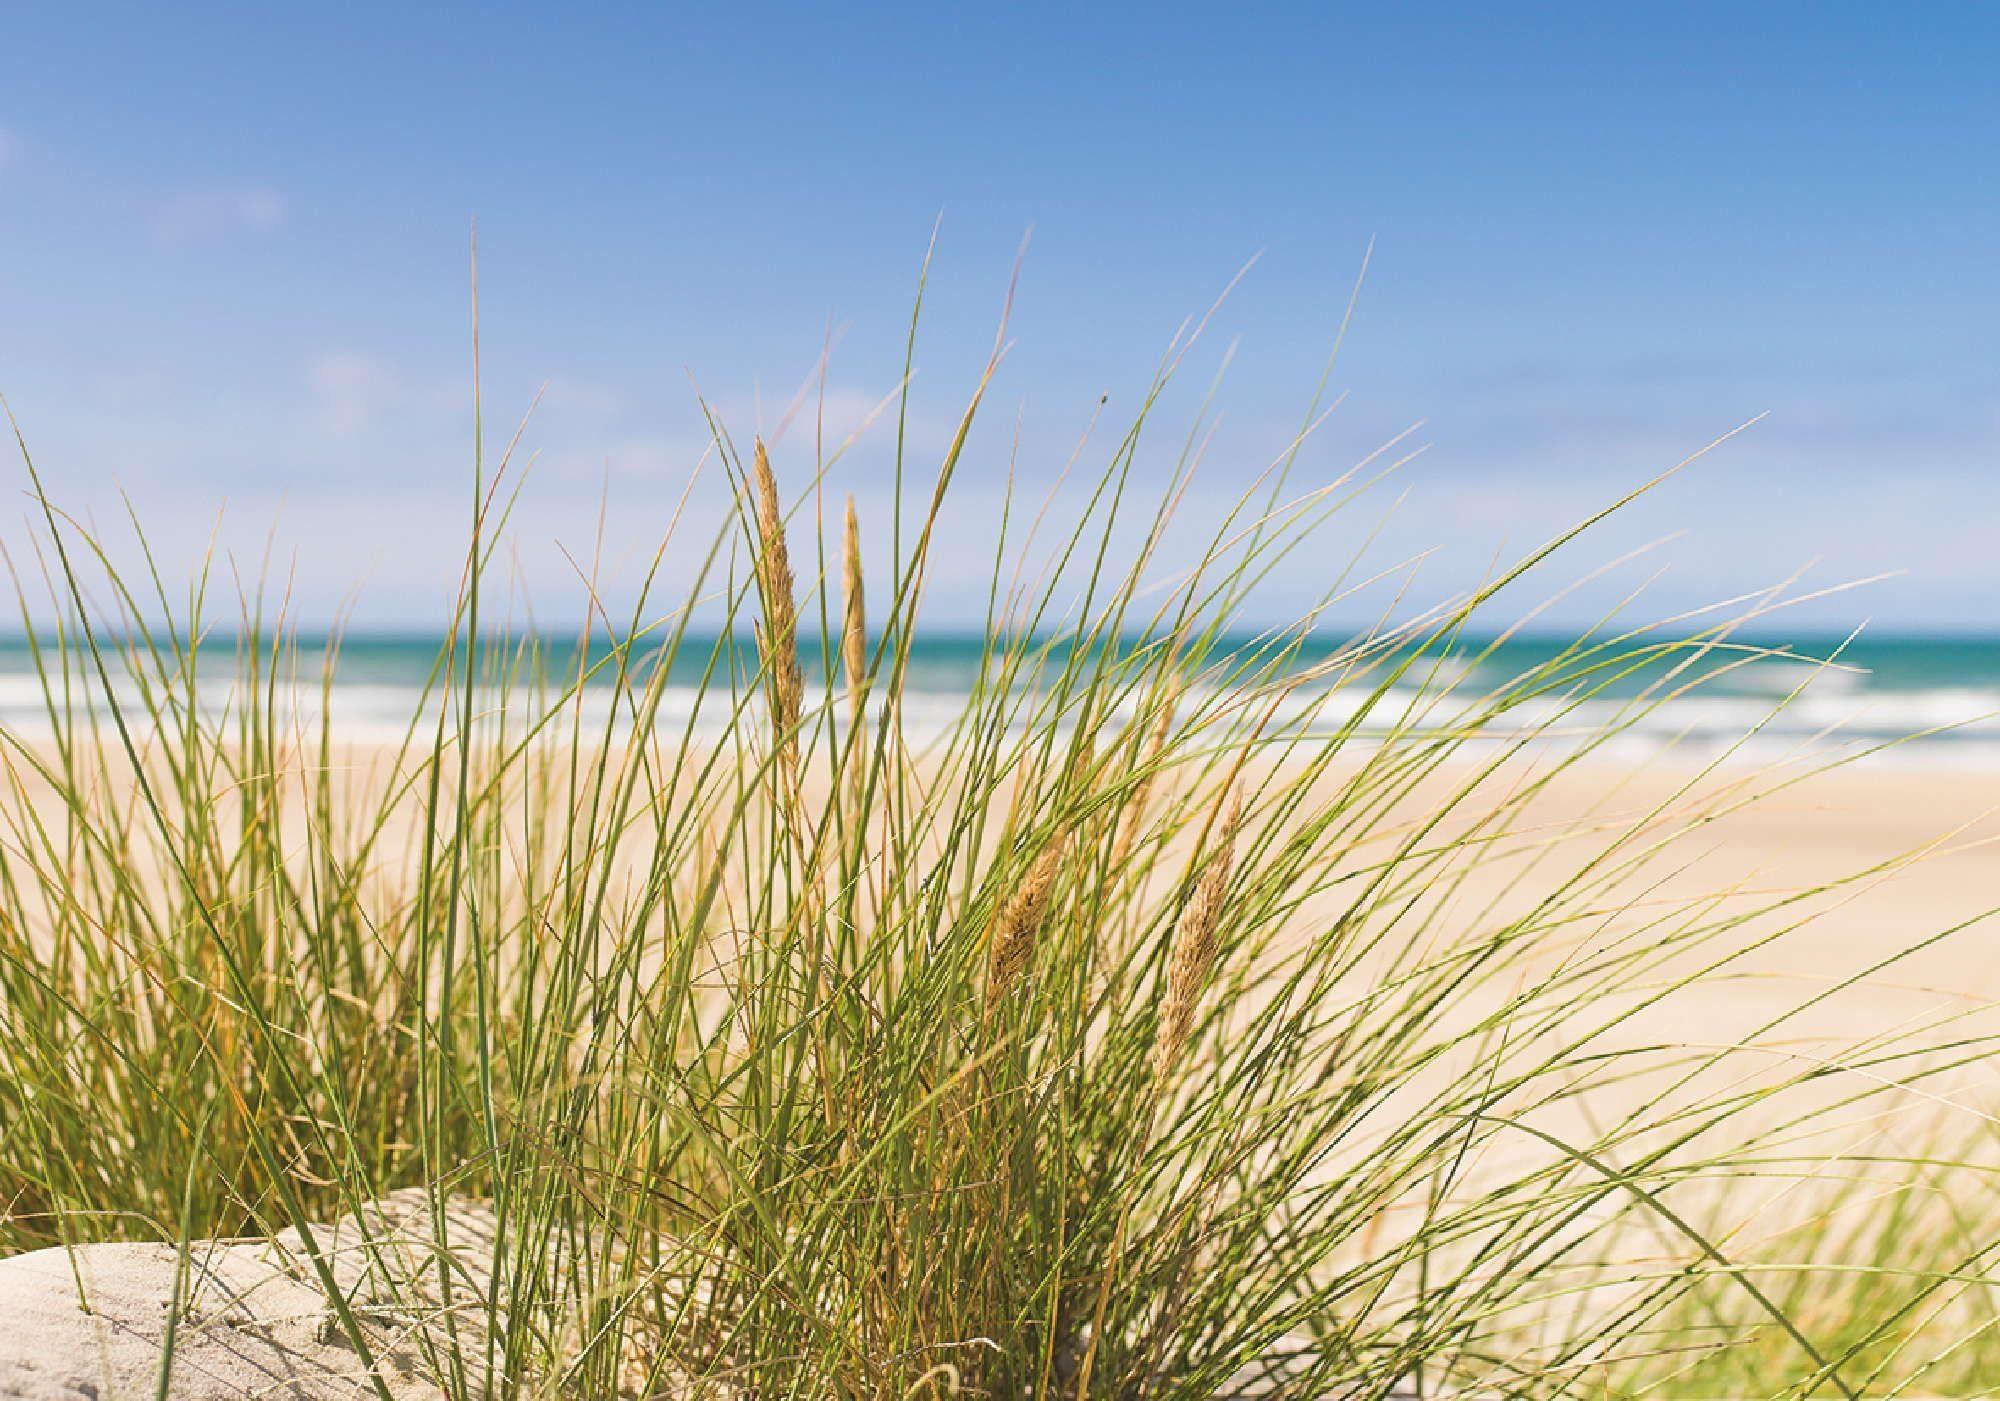 Home affaire Leinwandbild »Oliver: Strand mit Dünengras im Sand«, 70/50 cm